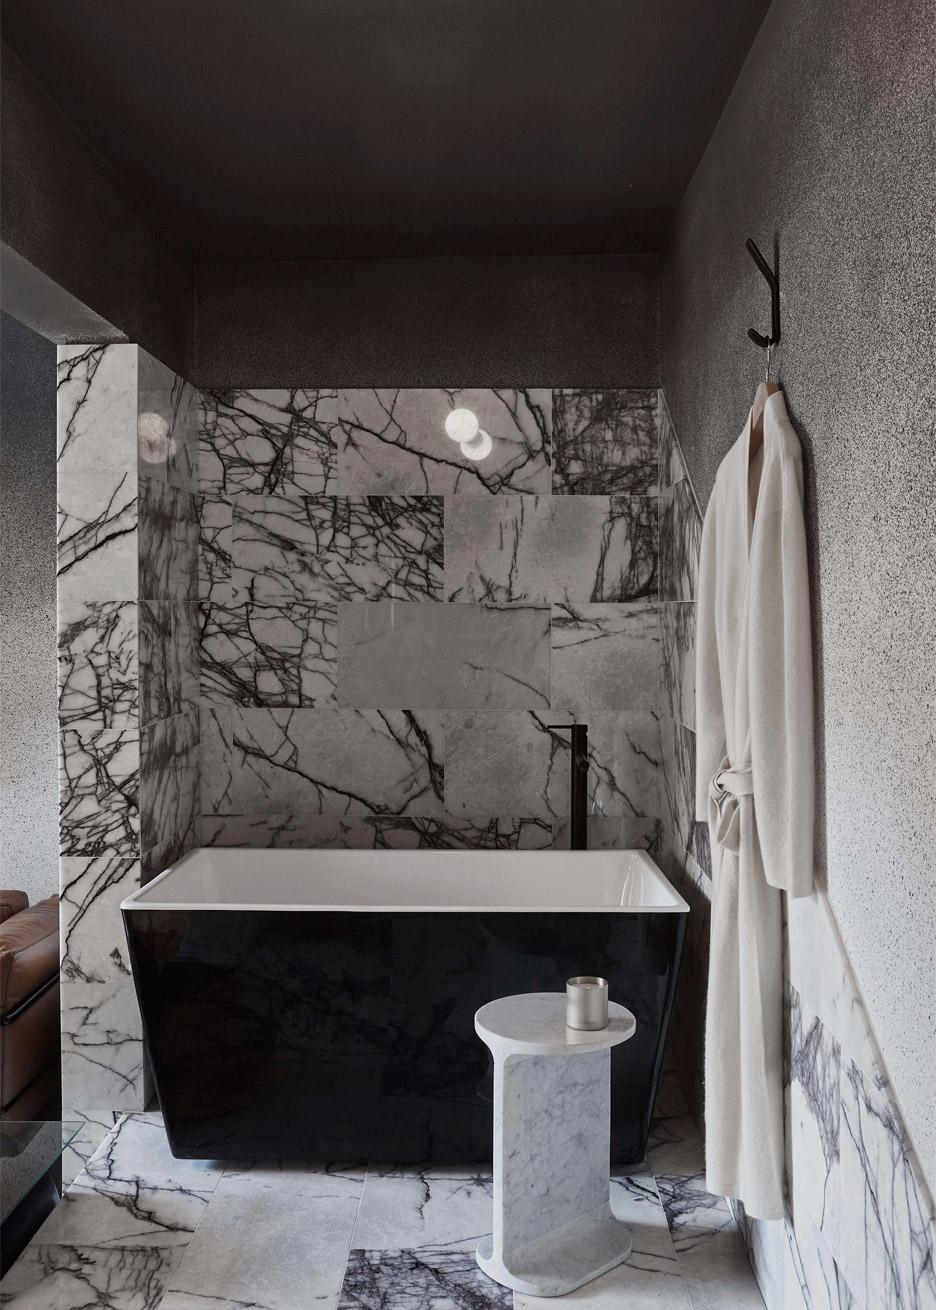 microlux-melbourne-australia-apartment-interior-design-edwards-moore_dezeen_936_9.jpg